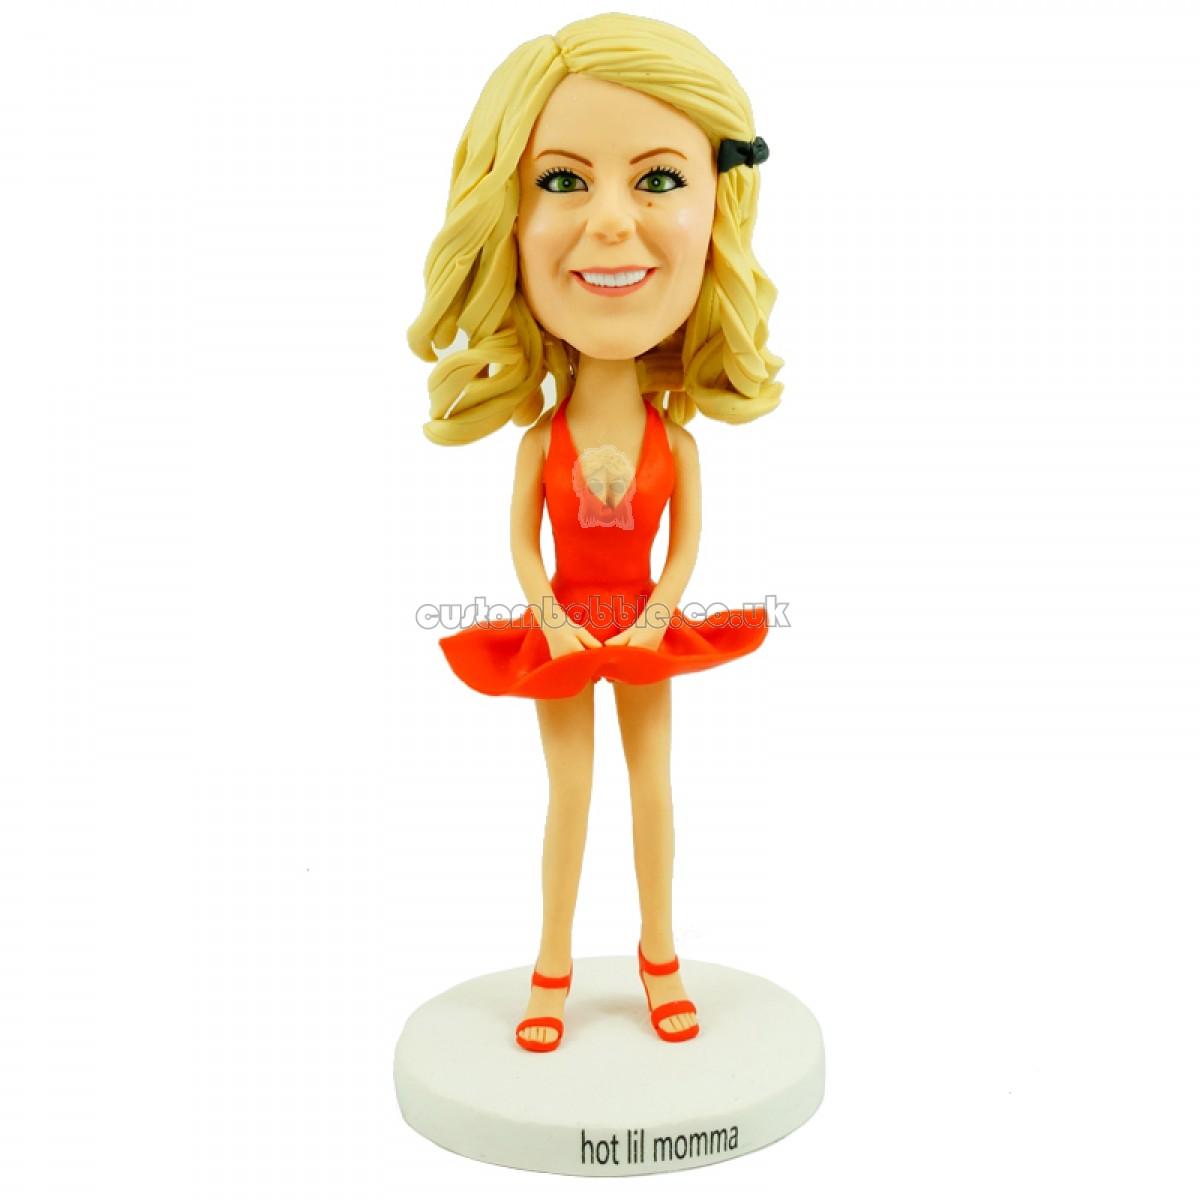 Lady Personalised Bobblehead